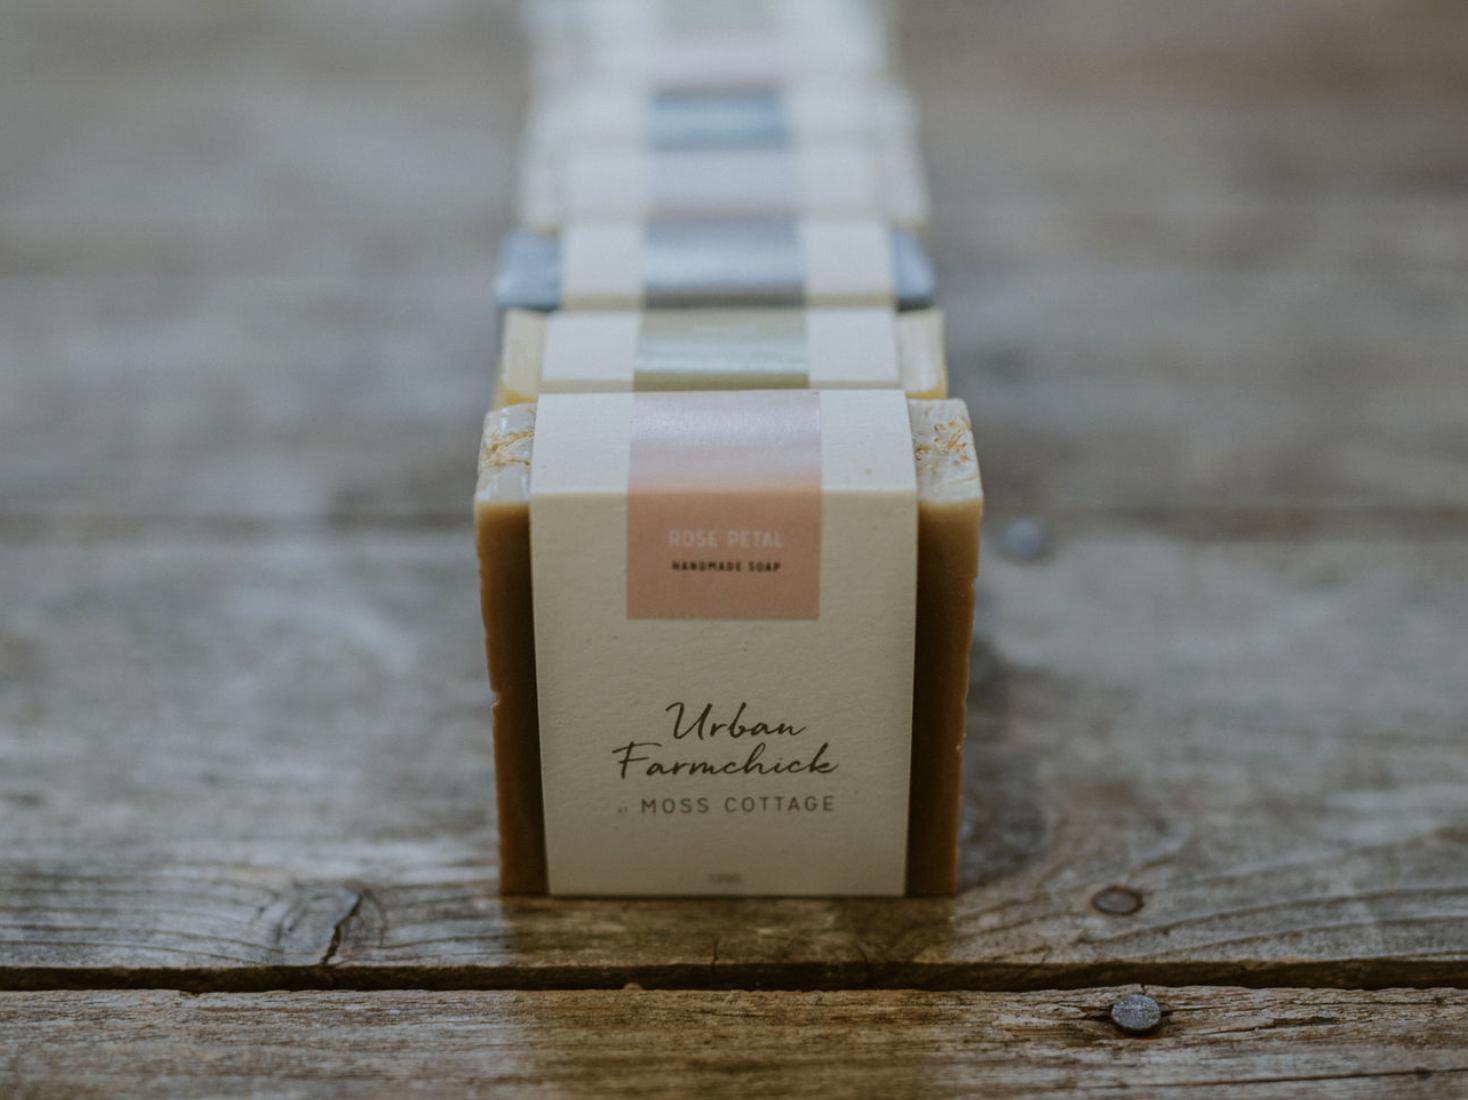 Urban Farmchick Soap essential oil labeldesign label packagingpro packaging mockup package packaging design